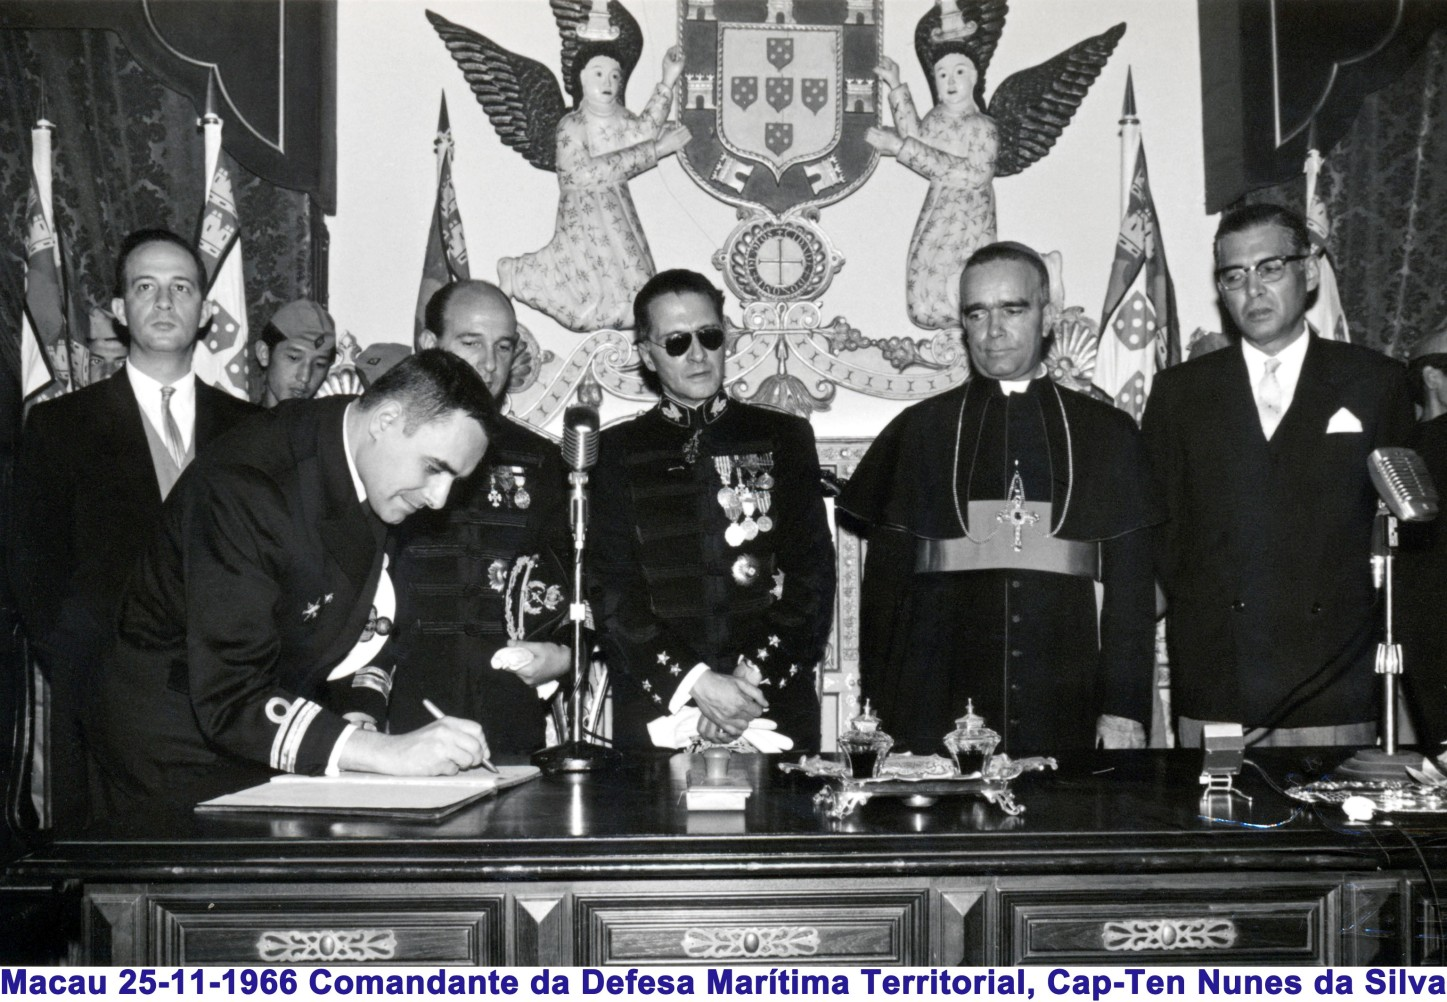 056 66-11-25 Comte Defesa Marítima Territorial assinando